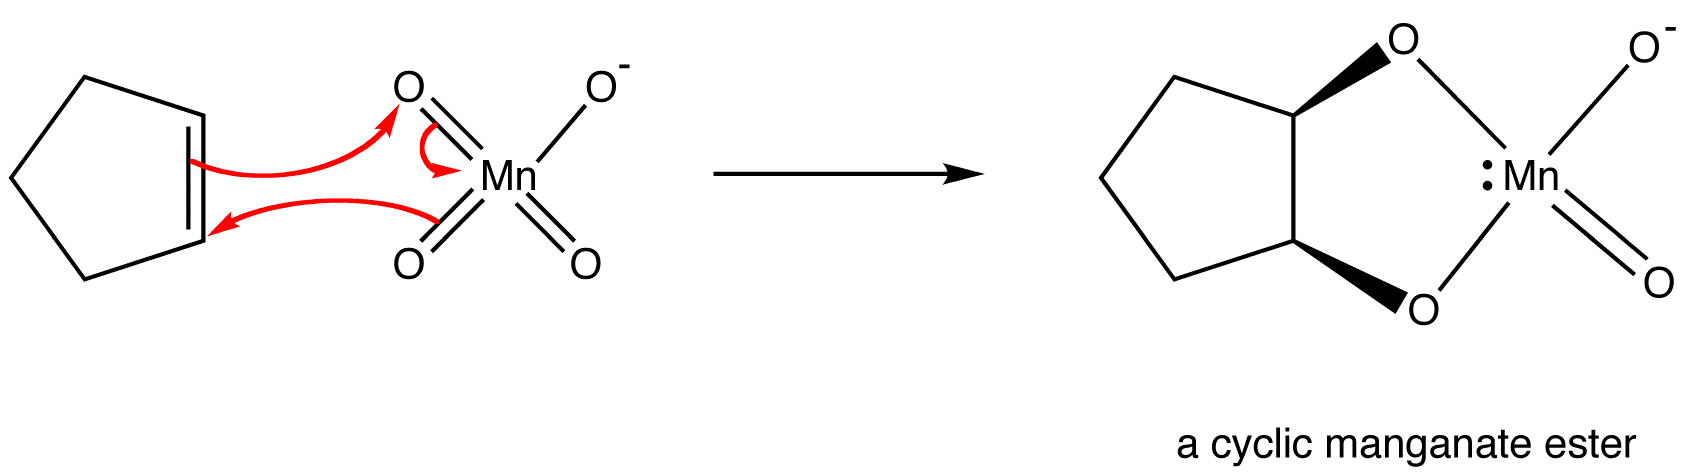 Cyclic Manganate Ester Ochempal